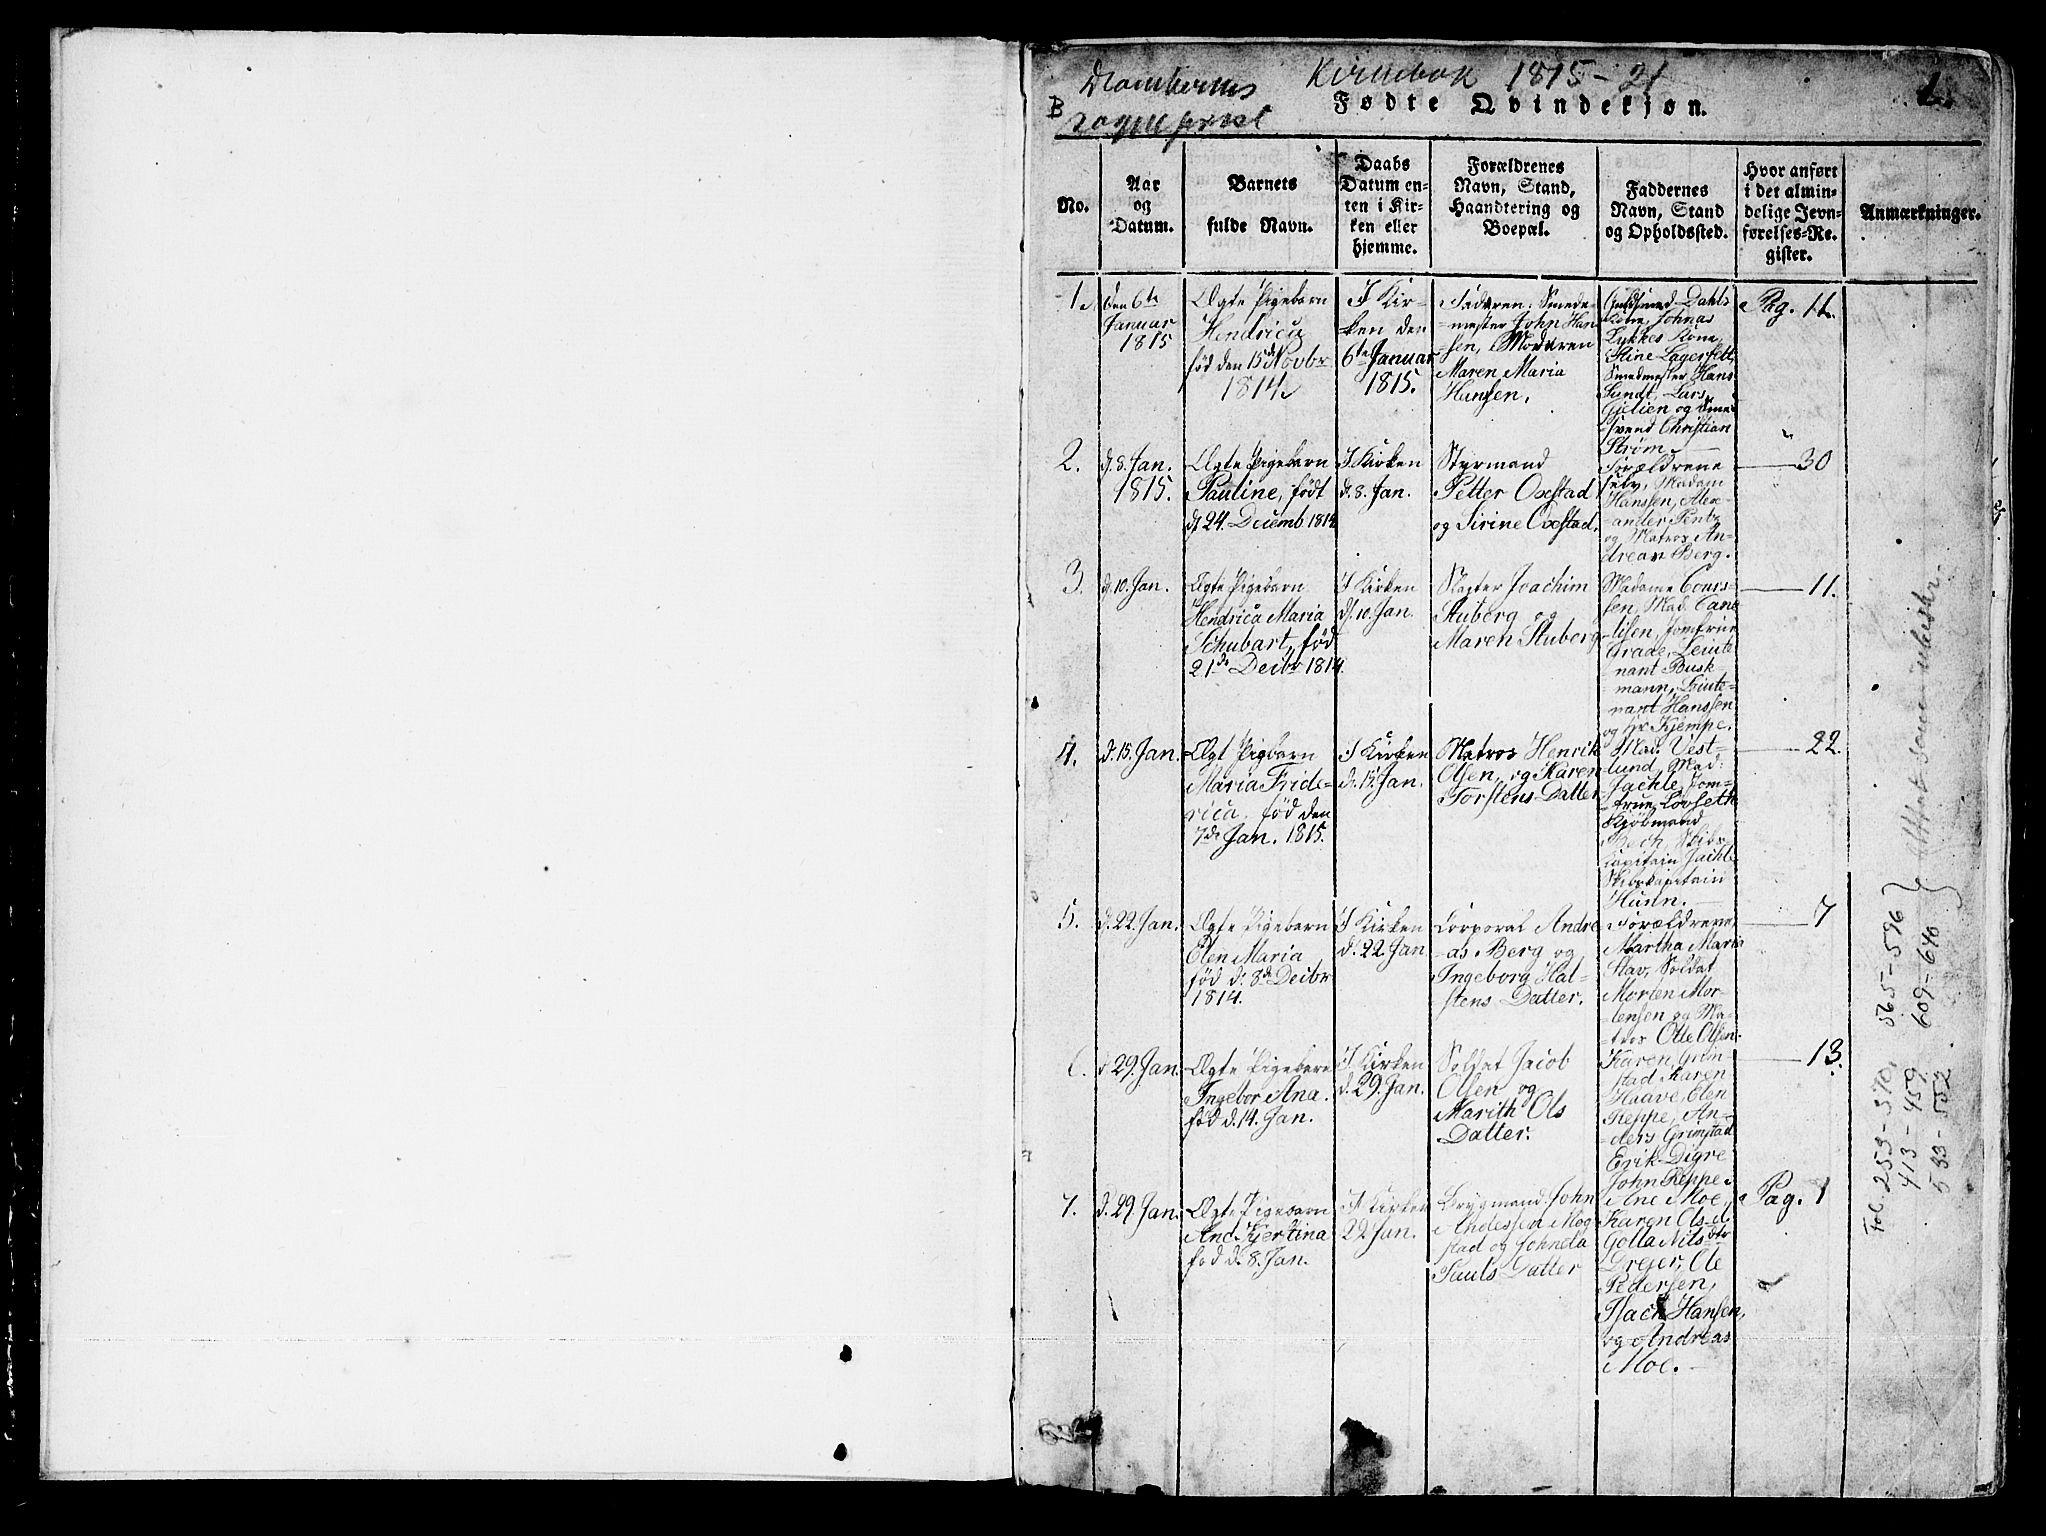 SAT, Ministerialprotokoller, klokkerbøker og fødselsregistre - Sør-Trøndelag, 601/L0043: Parish register (official) no. 601A11, 1815-1821, p. 0-1